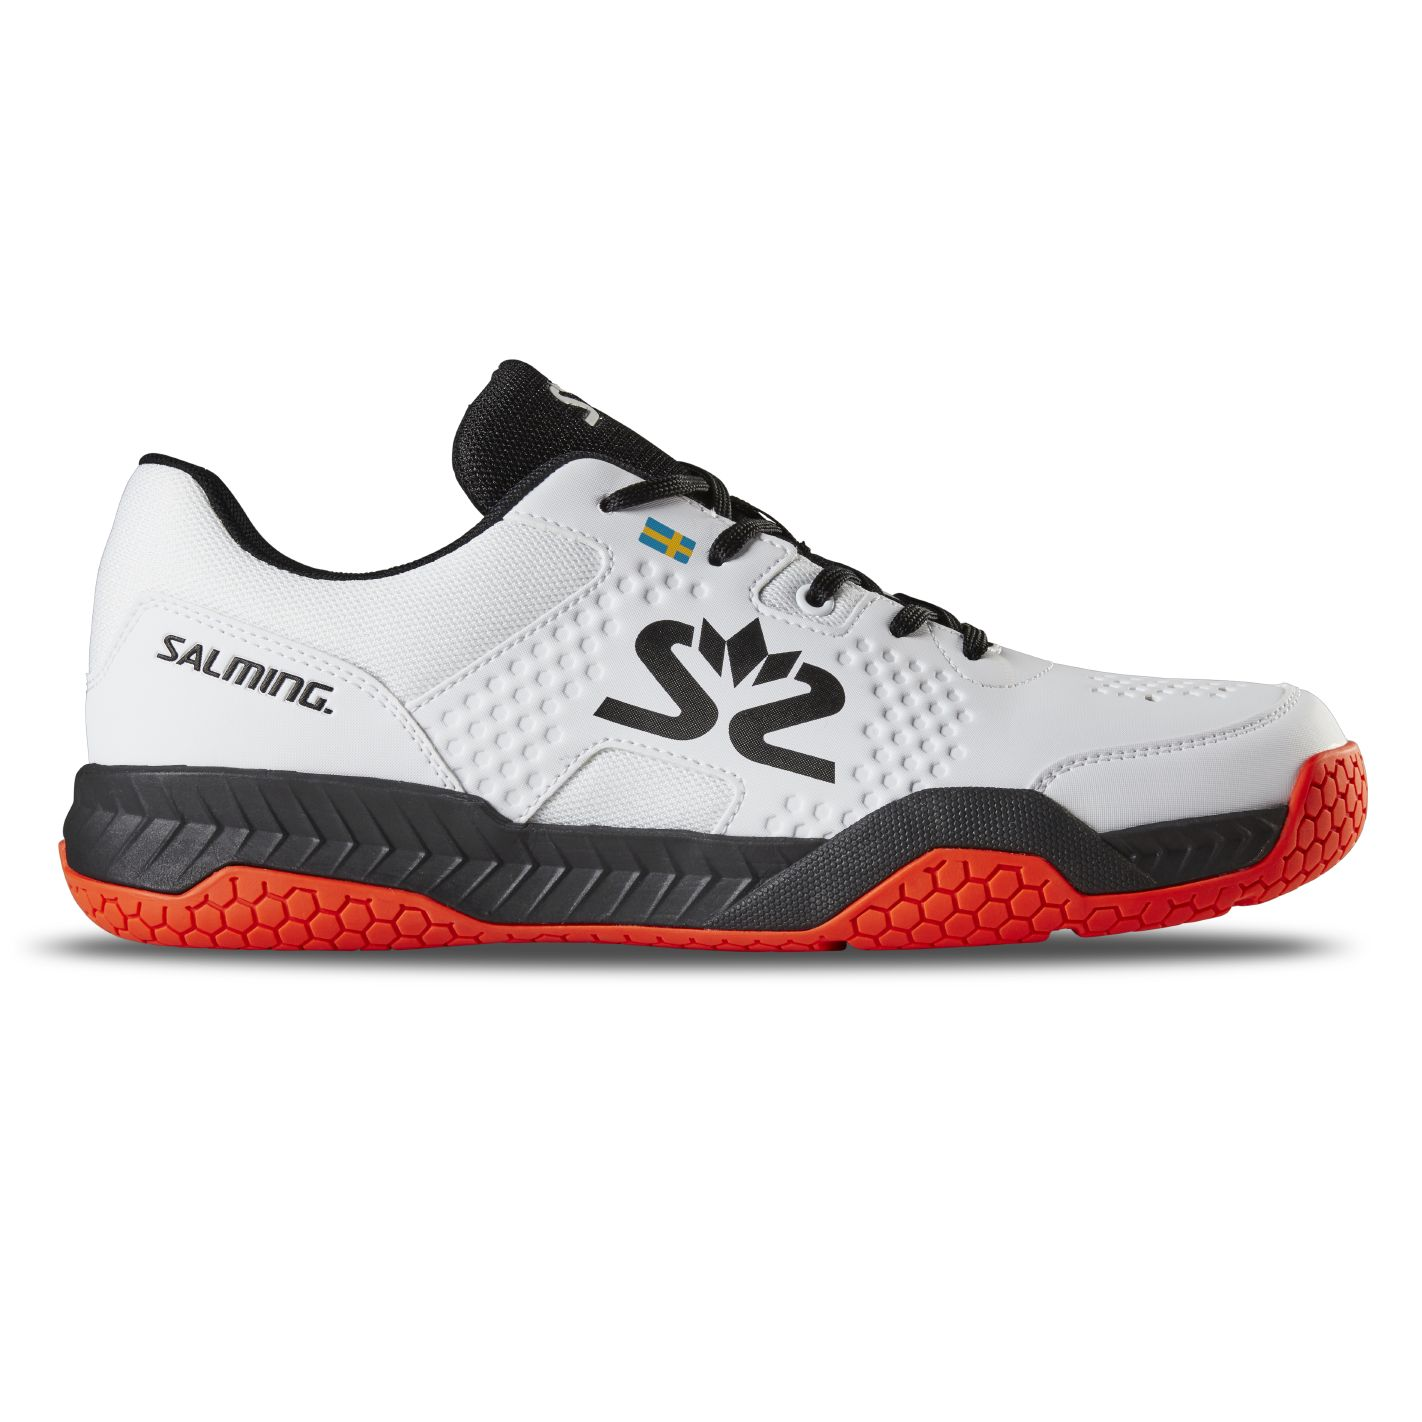 Salming Hawk Court Shoe Men White/Black 8 UK - 42 2/3 EUR - 27 cm